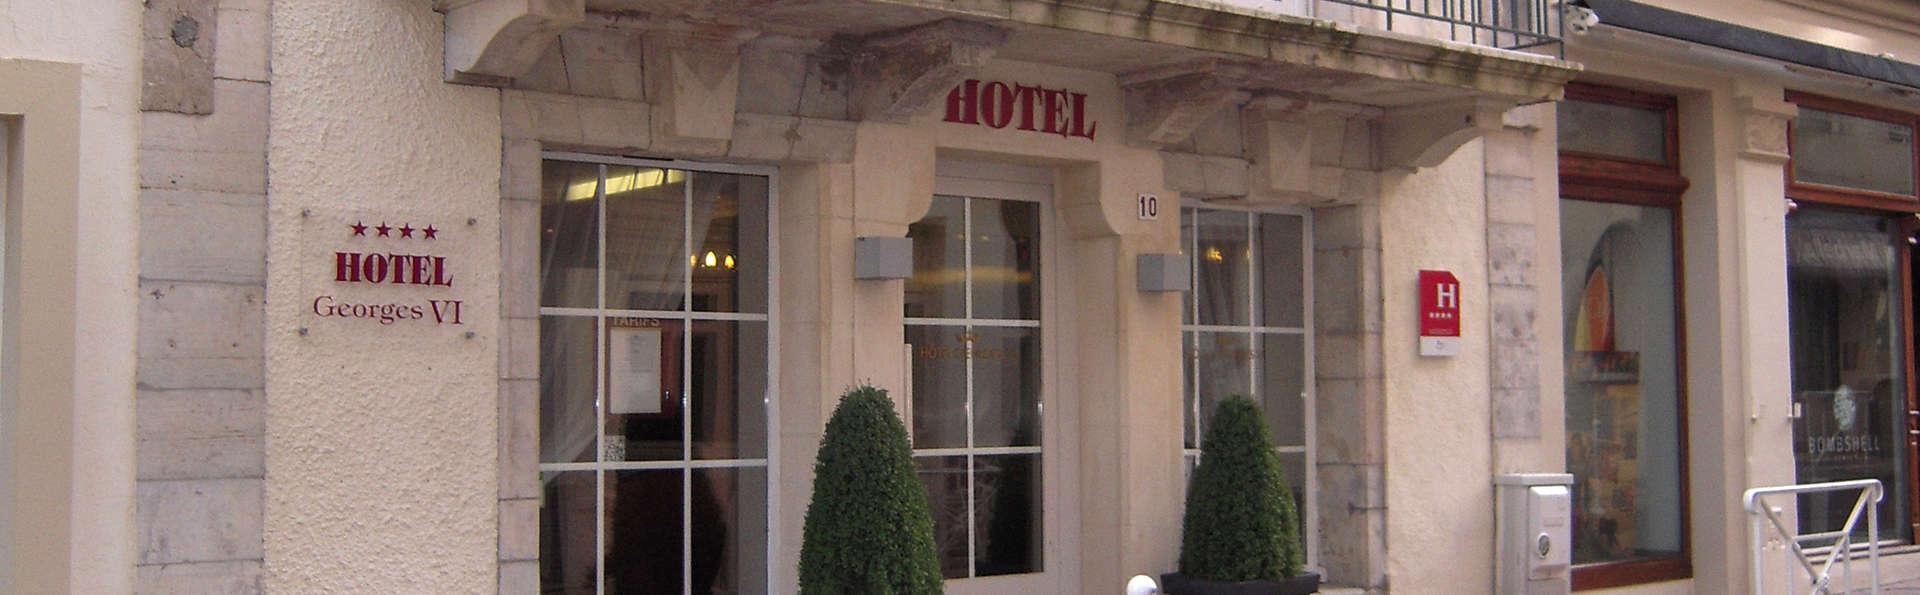 Hôtel Georges VI - Biarritz - edit_front.jpg